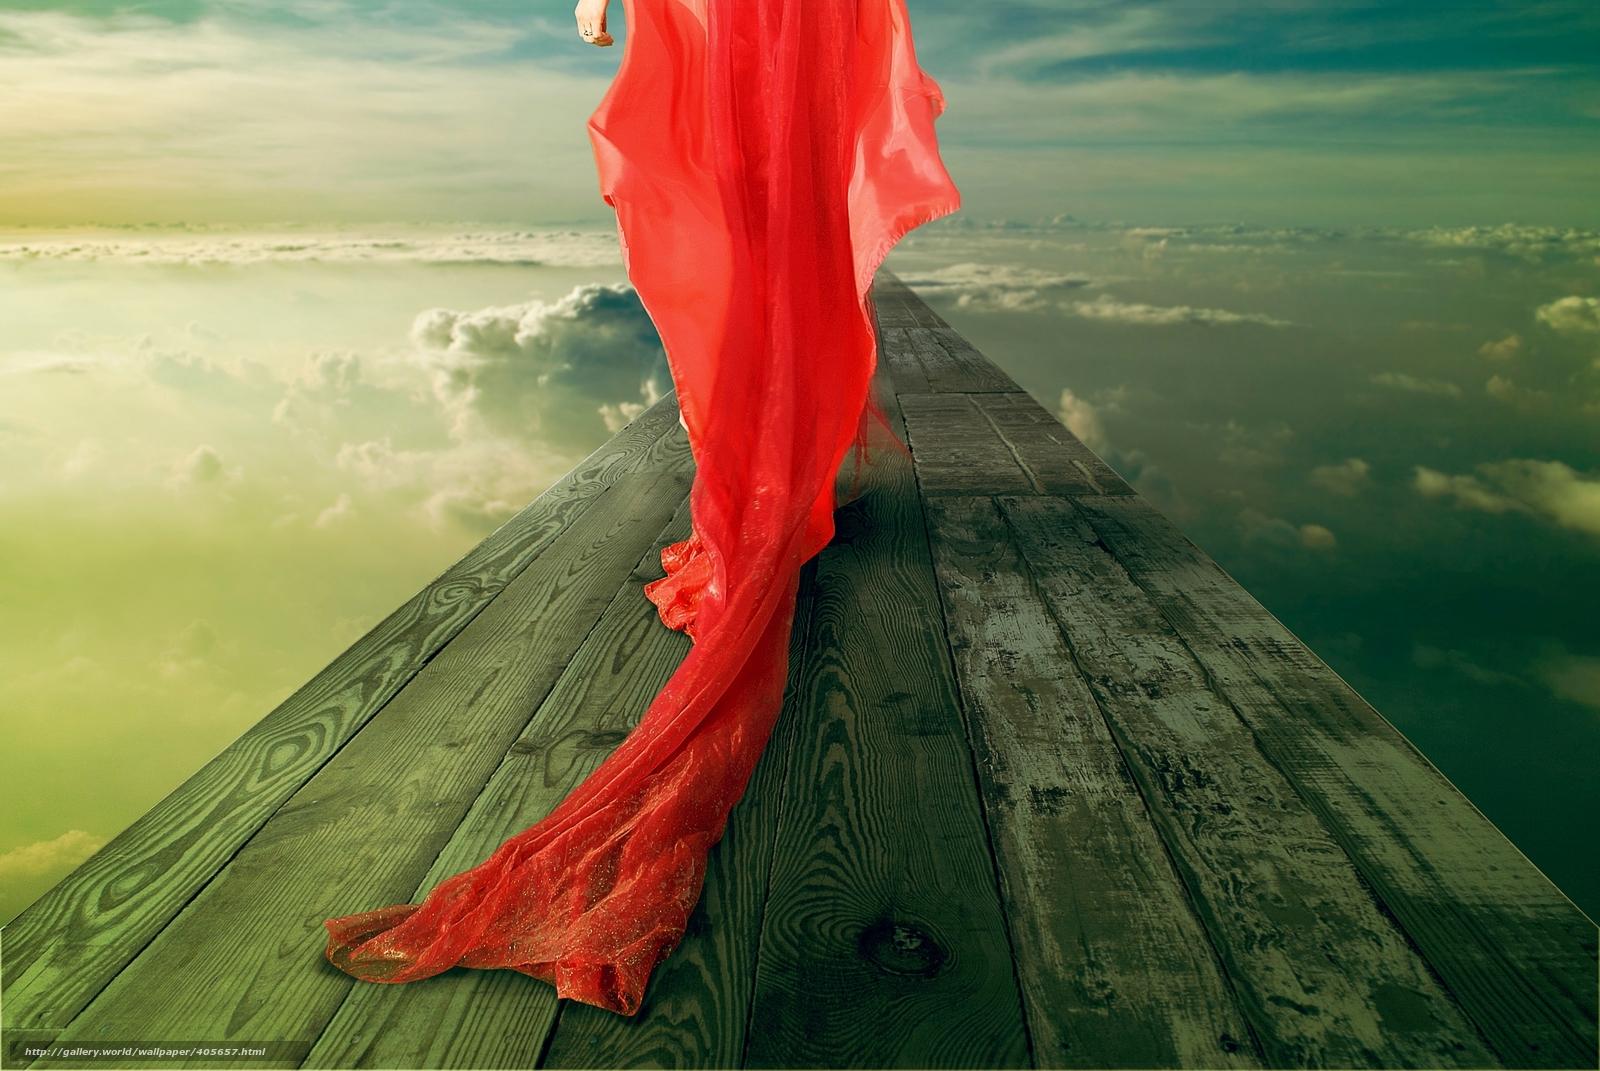 Download wallpaper girl in red dress, plume, bridge, sky free desktop ...: gde-fon.com/download/girl-in-red-dress_plume_bridge_sky_clouds_ring...